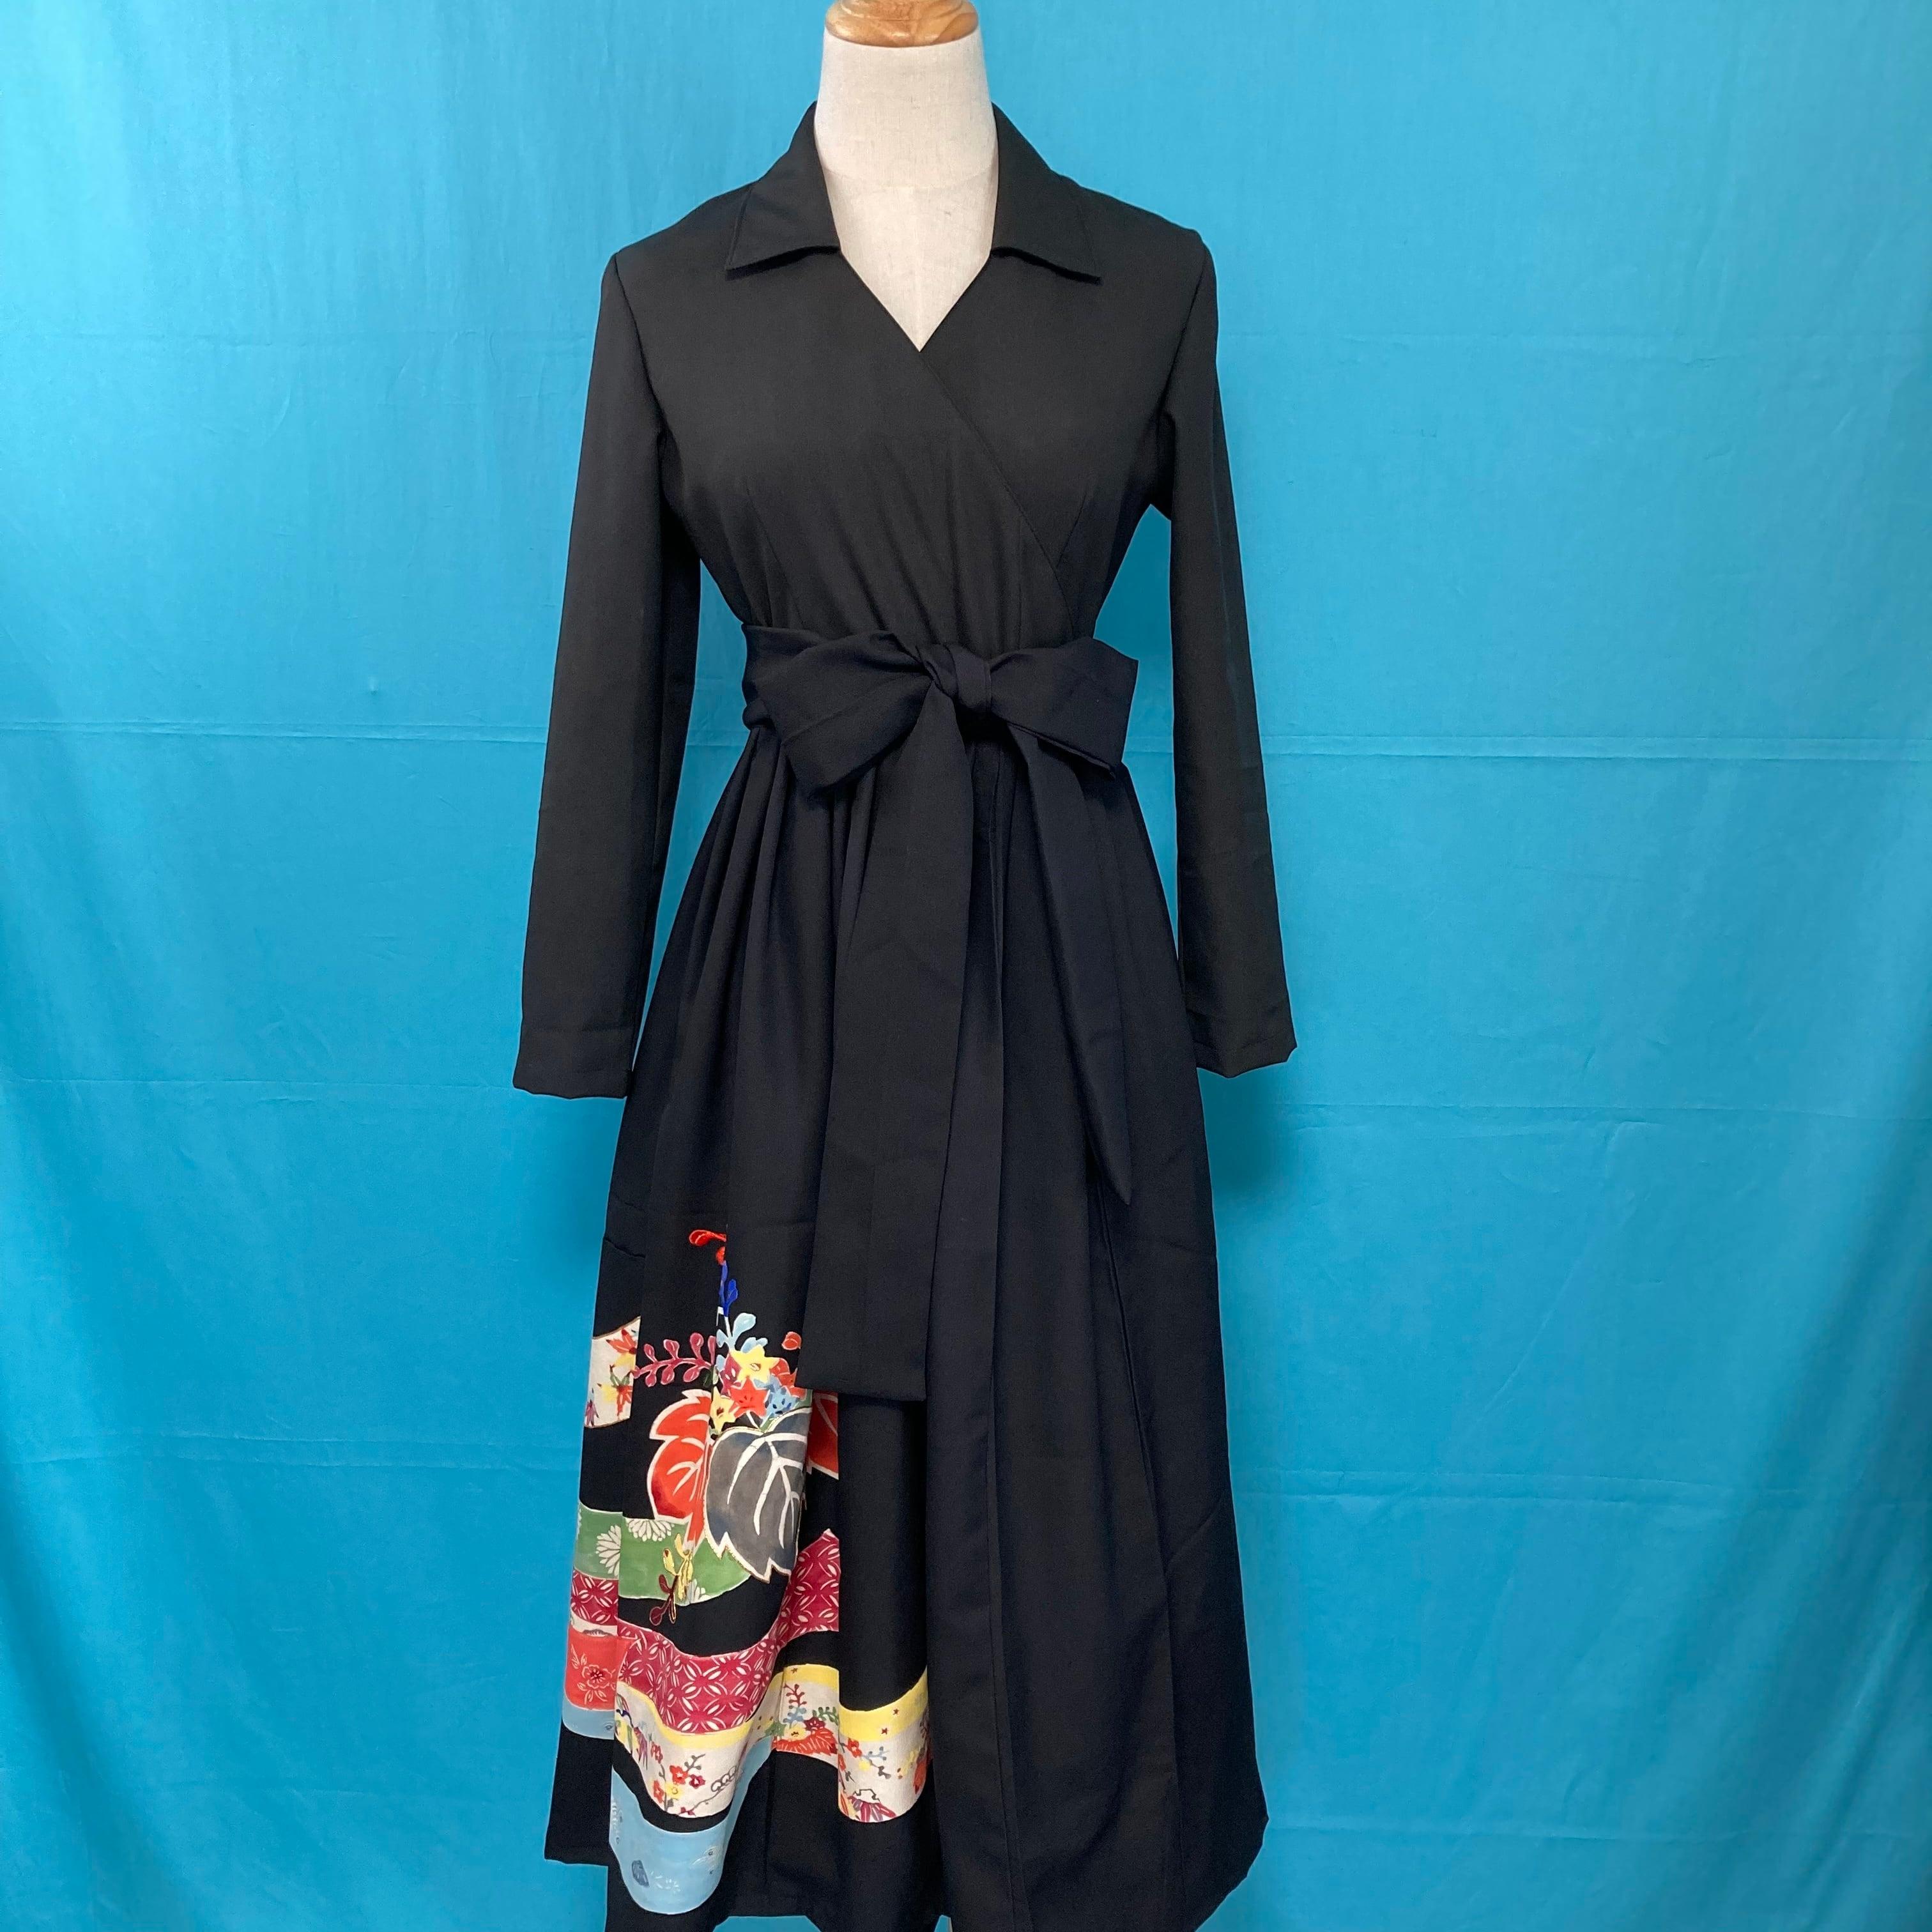 Vintage black embroidery kimono dress/ US 6 rayon